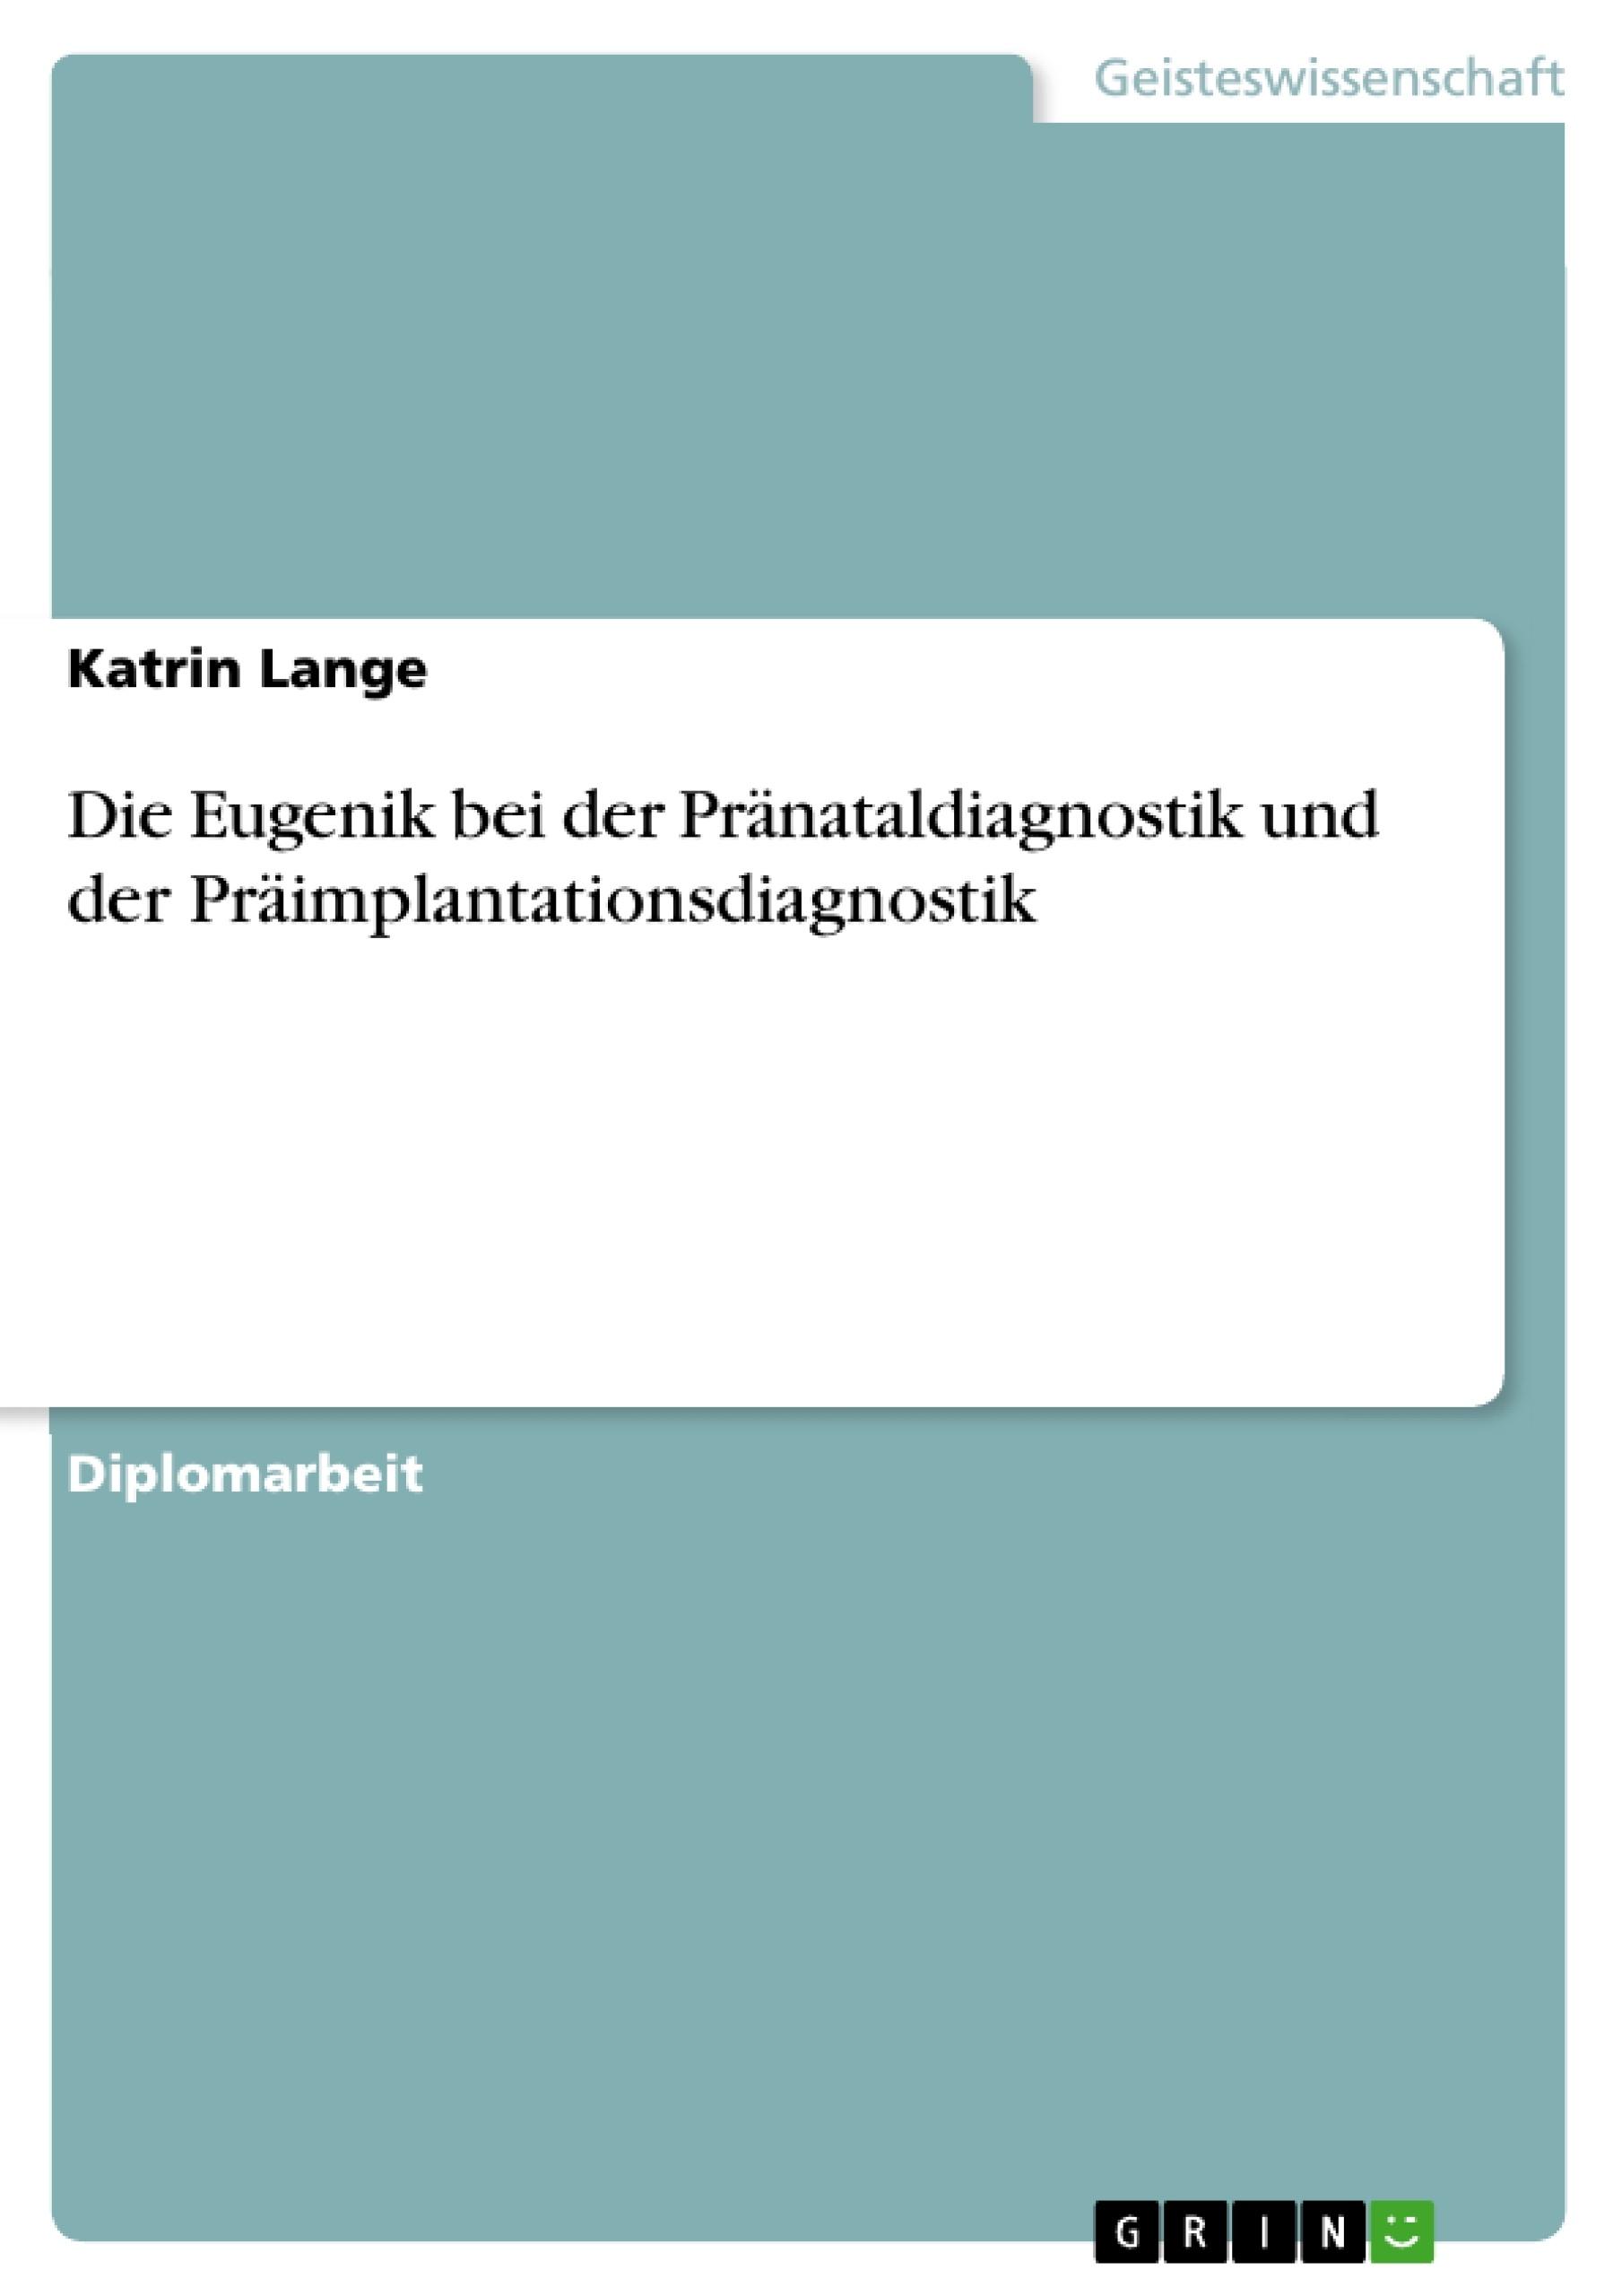 Titel: Die Eugenik bei der Pränataldiagnostik und der Präimplantationsdiagnostik